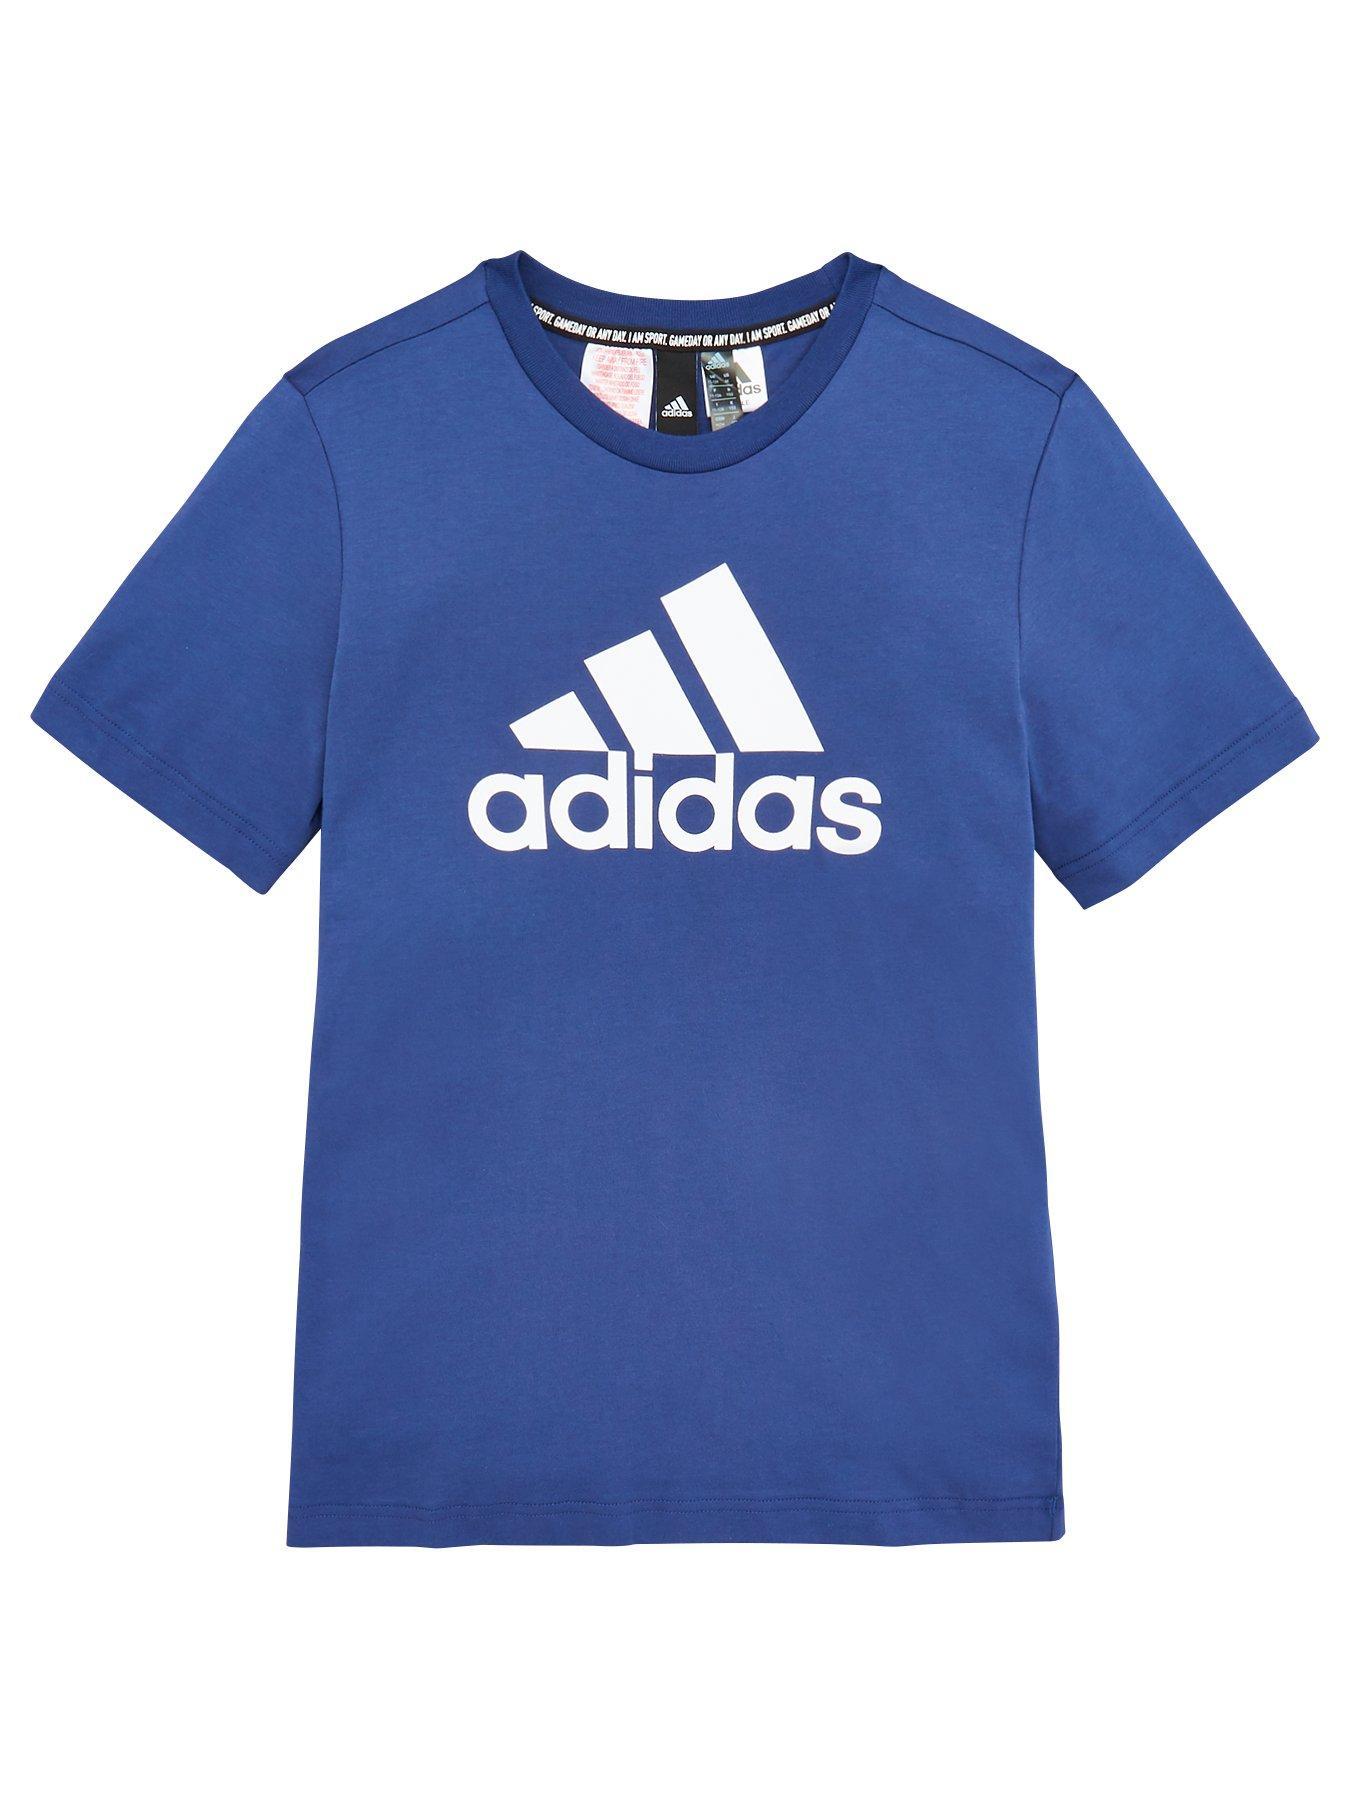 adidas youth t shirts